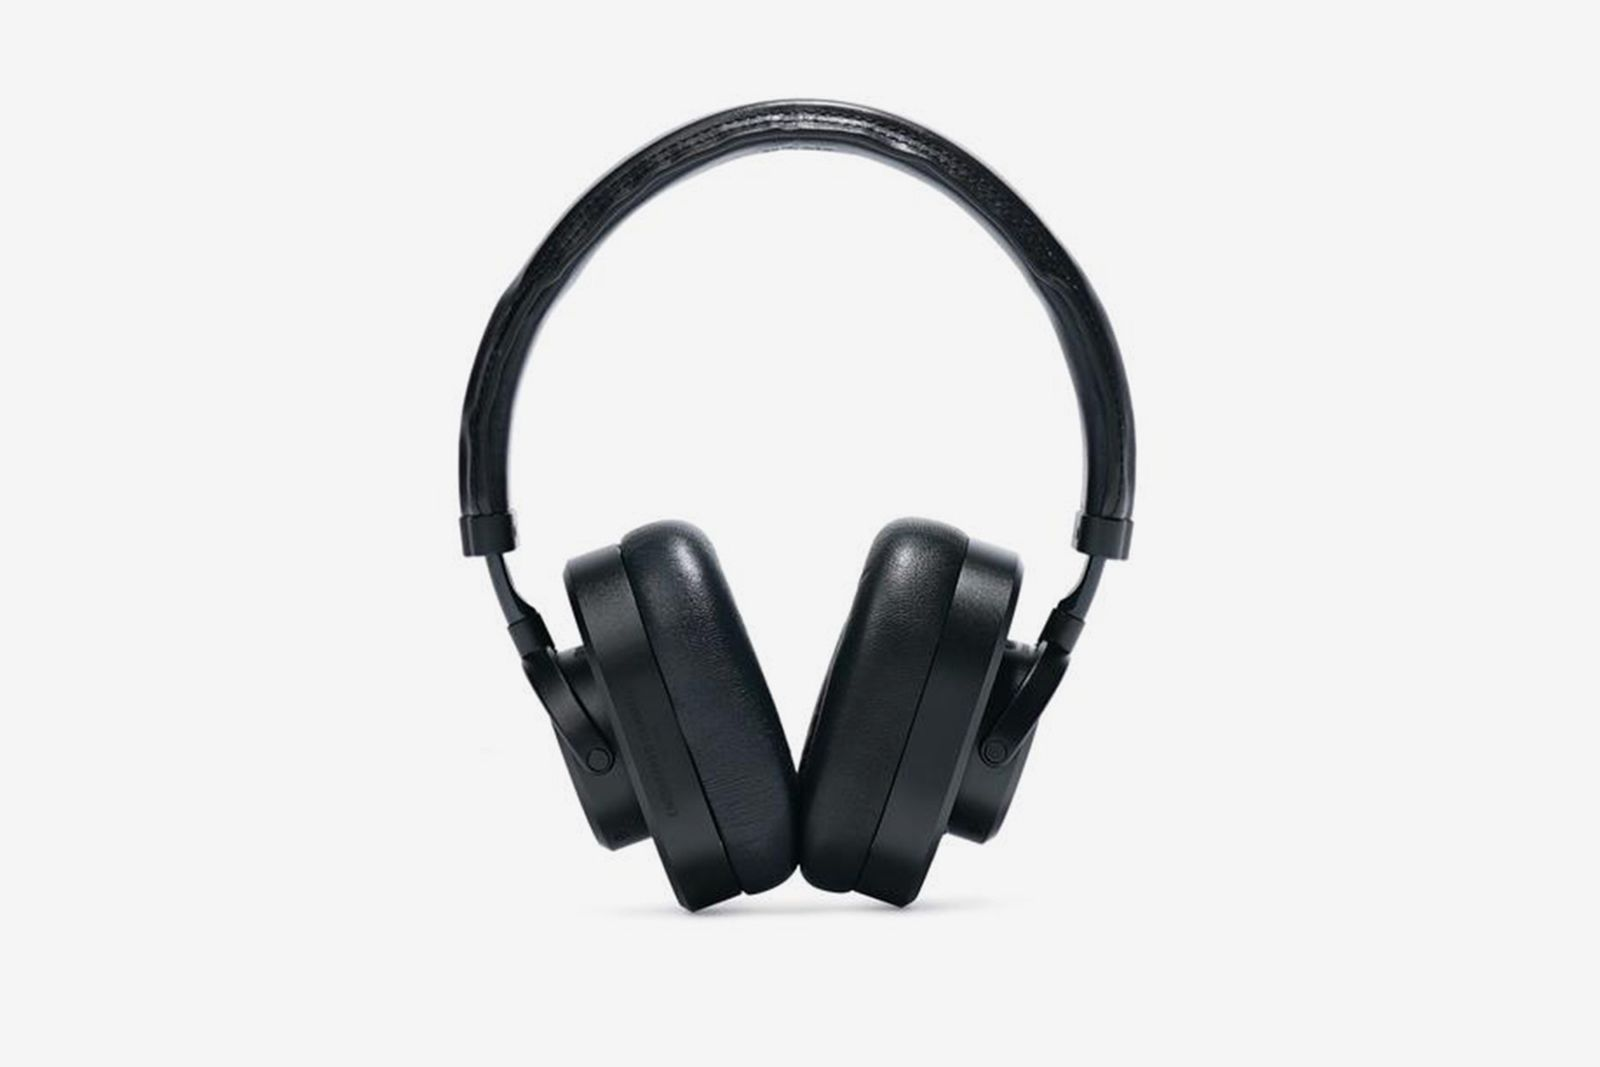 master-dynamic-engineered-garments-headphone-03